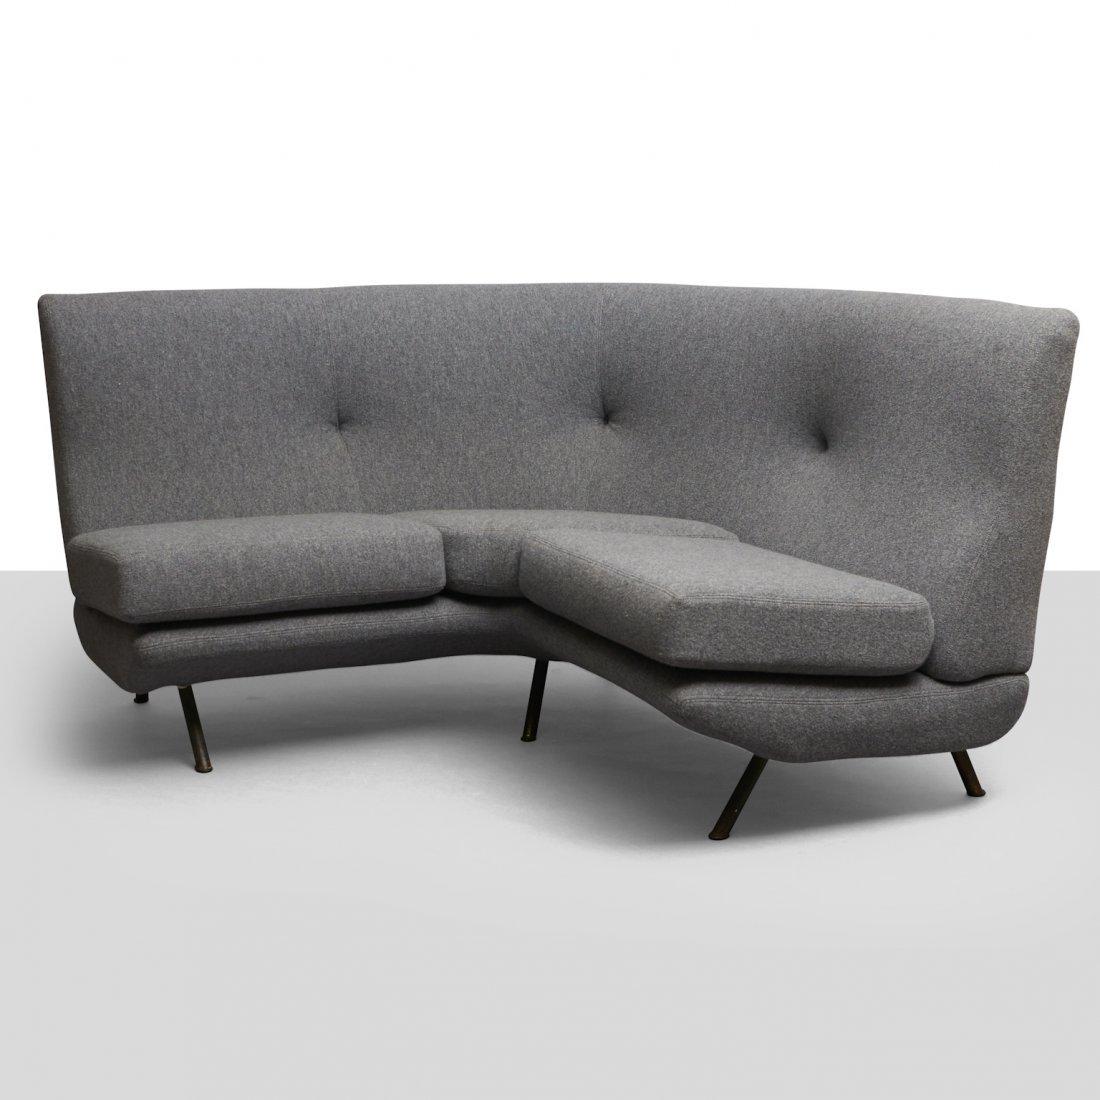 Marco Zanuso, Trianneal Corner Sofa